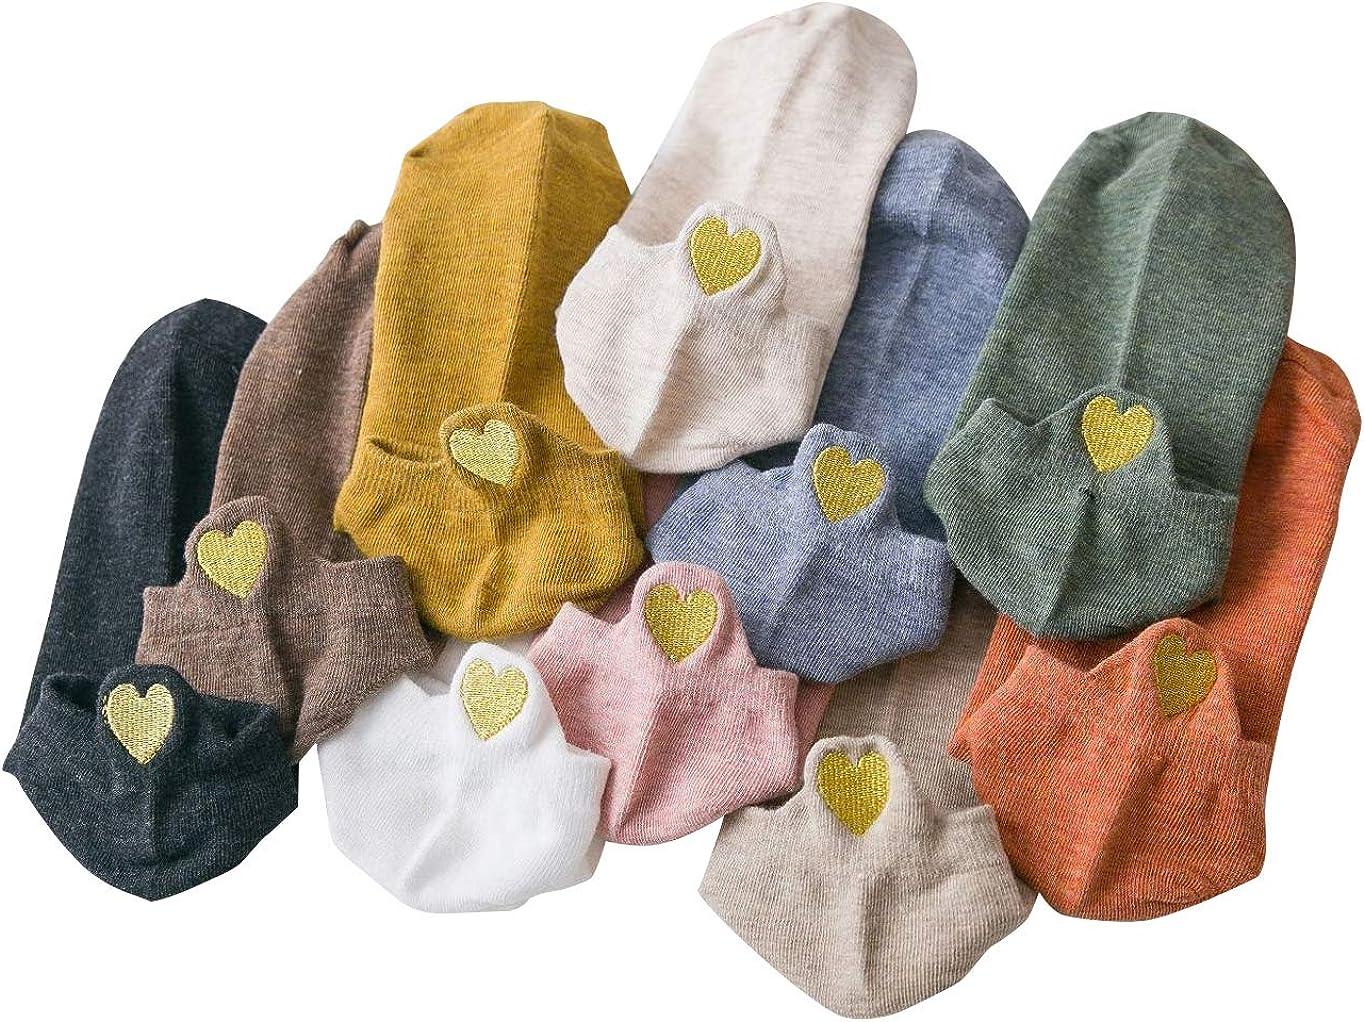 10 Paar Yidarton Damen Socken Baumwolle Komfortabel Netter Cartoon Bestickte Lustig kurz Frauen Socken